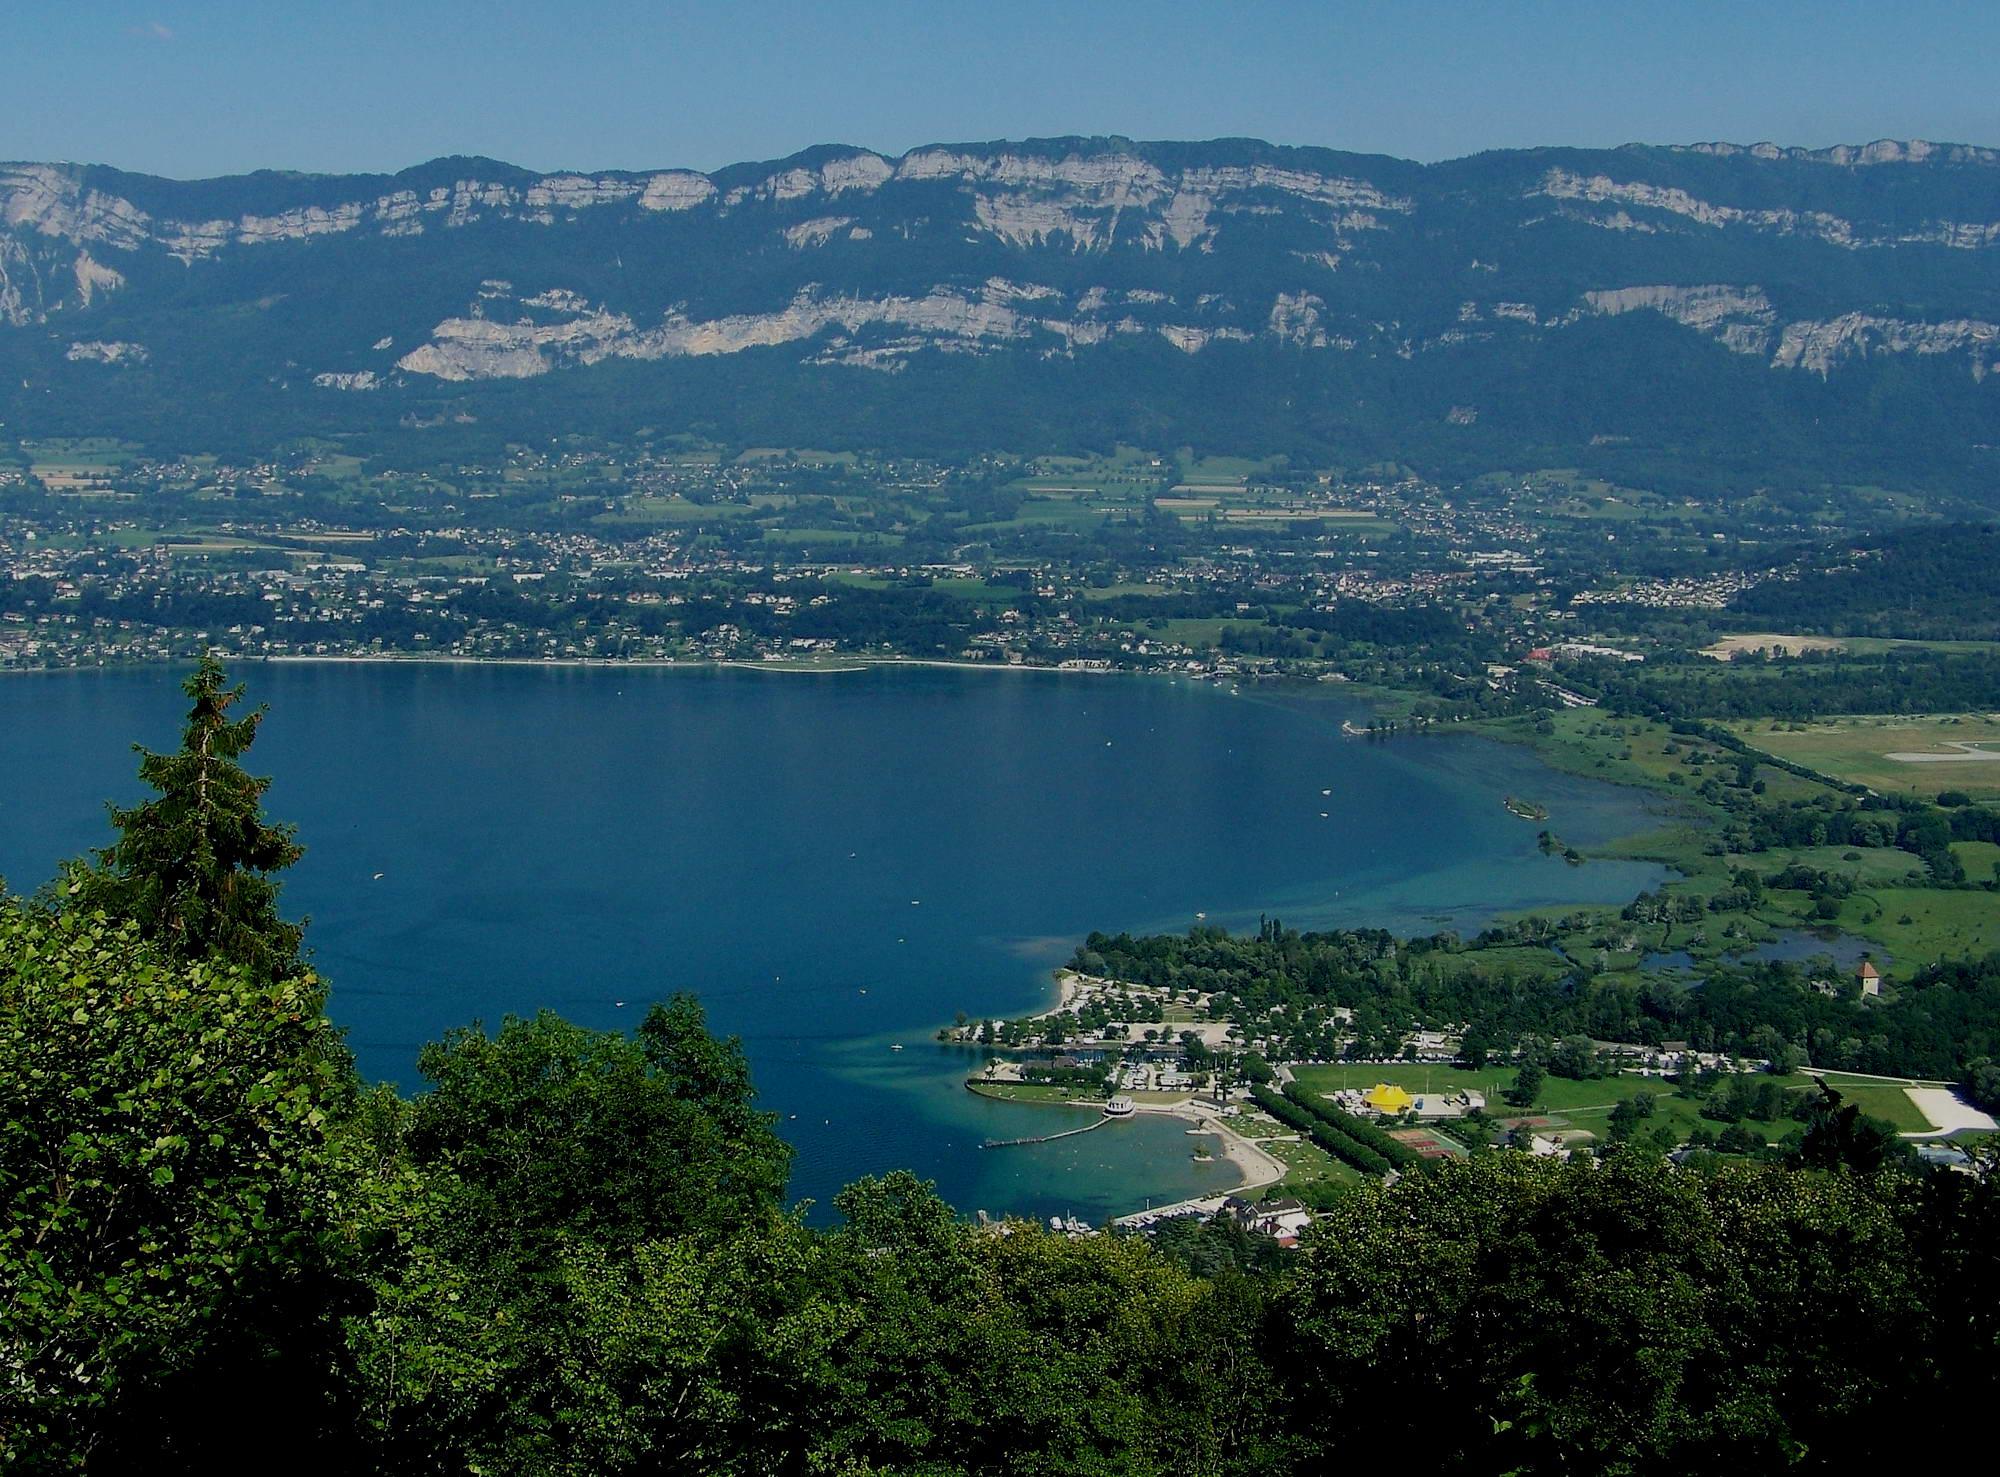 https://fr.m.wikipedia.org/wiki/Fichier:Lac_du_Bourget_Sud.JPG